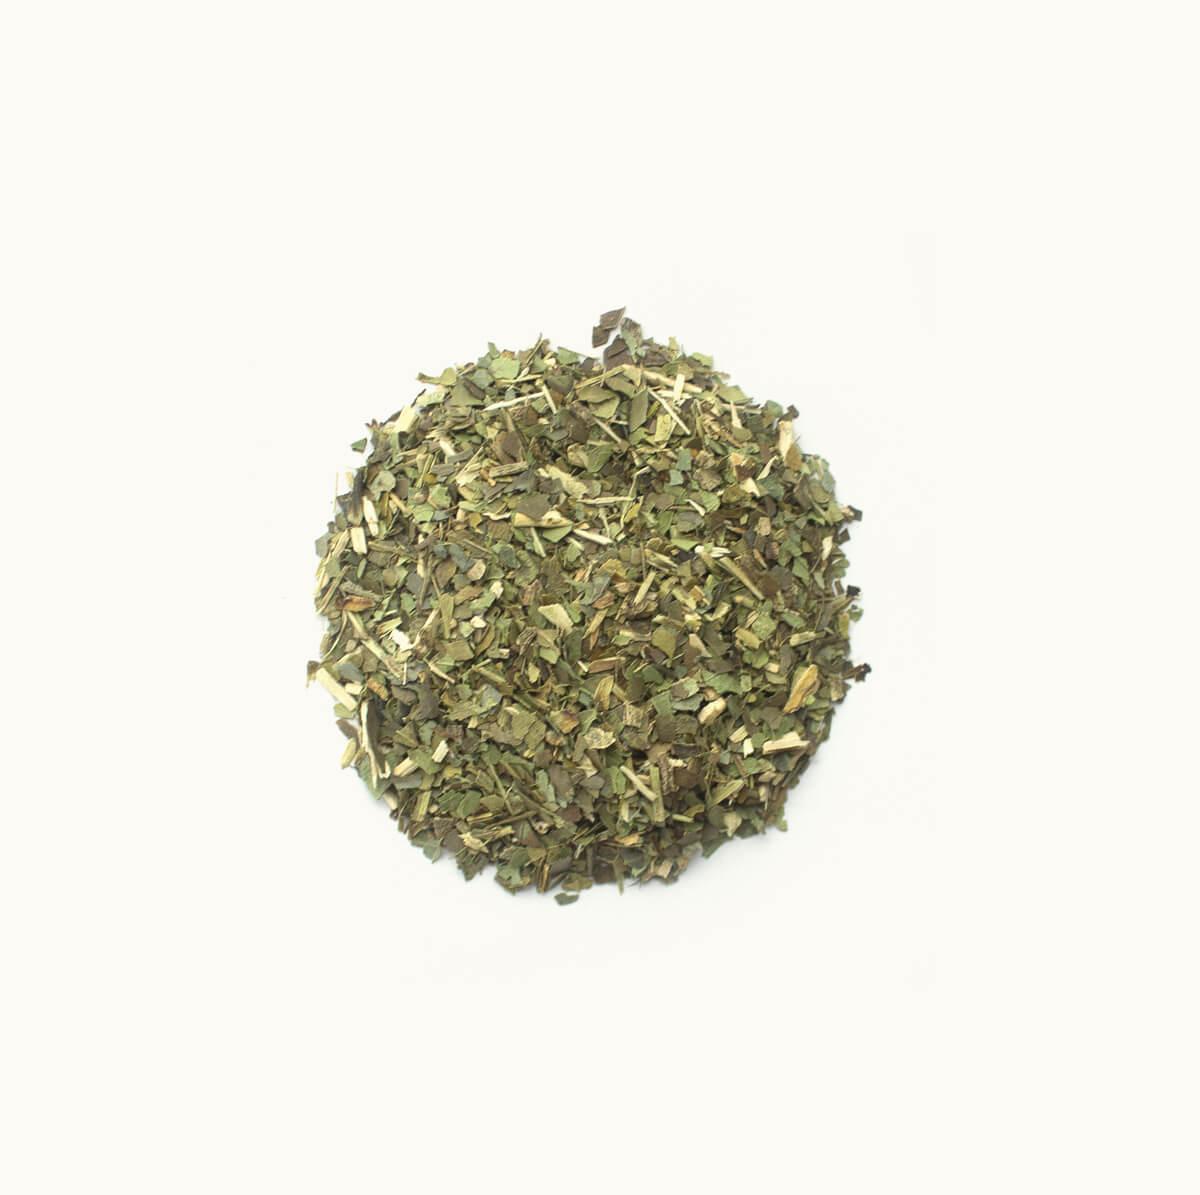 CHÁ BRANCO - Camellia sinensis - 30g